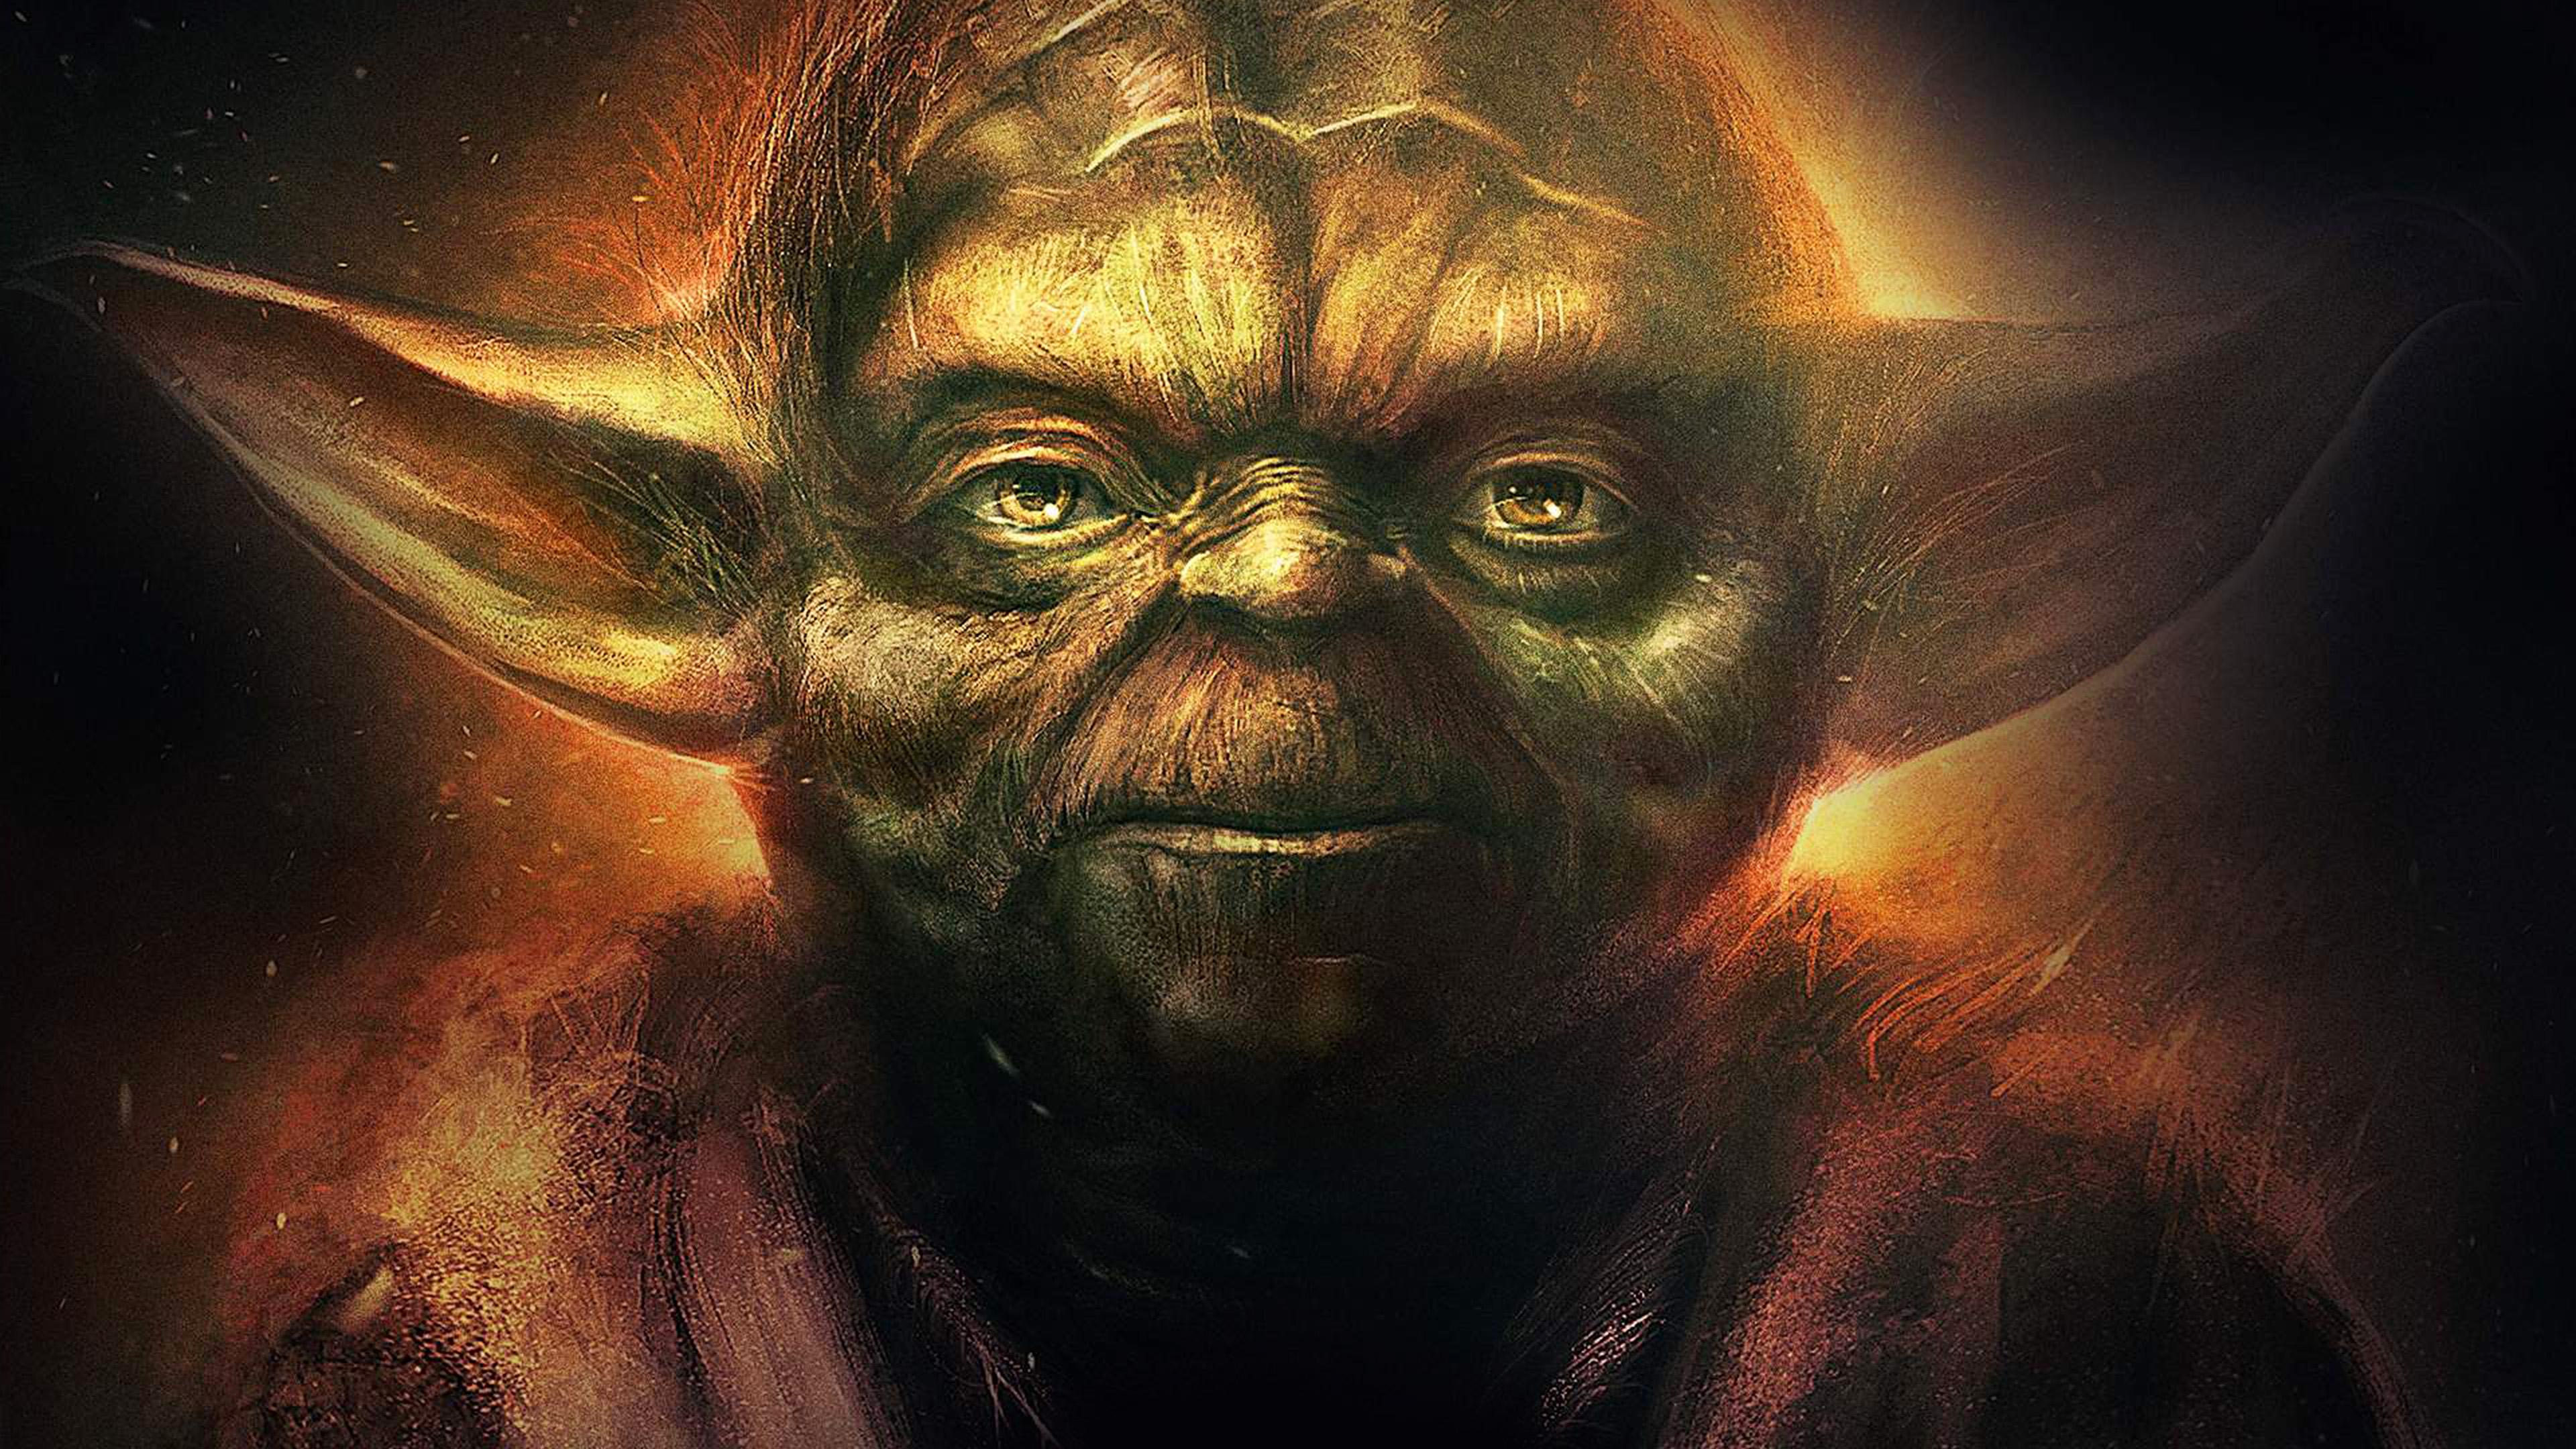 An79 Yoda Starwars Art Dark Illlust Film Poster Papers Co